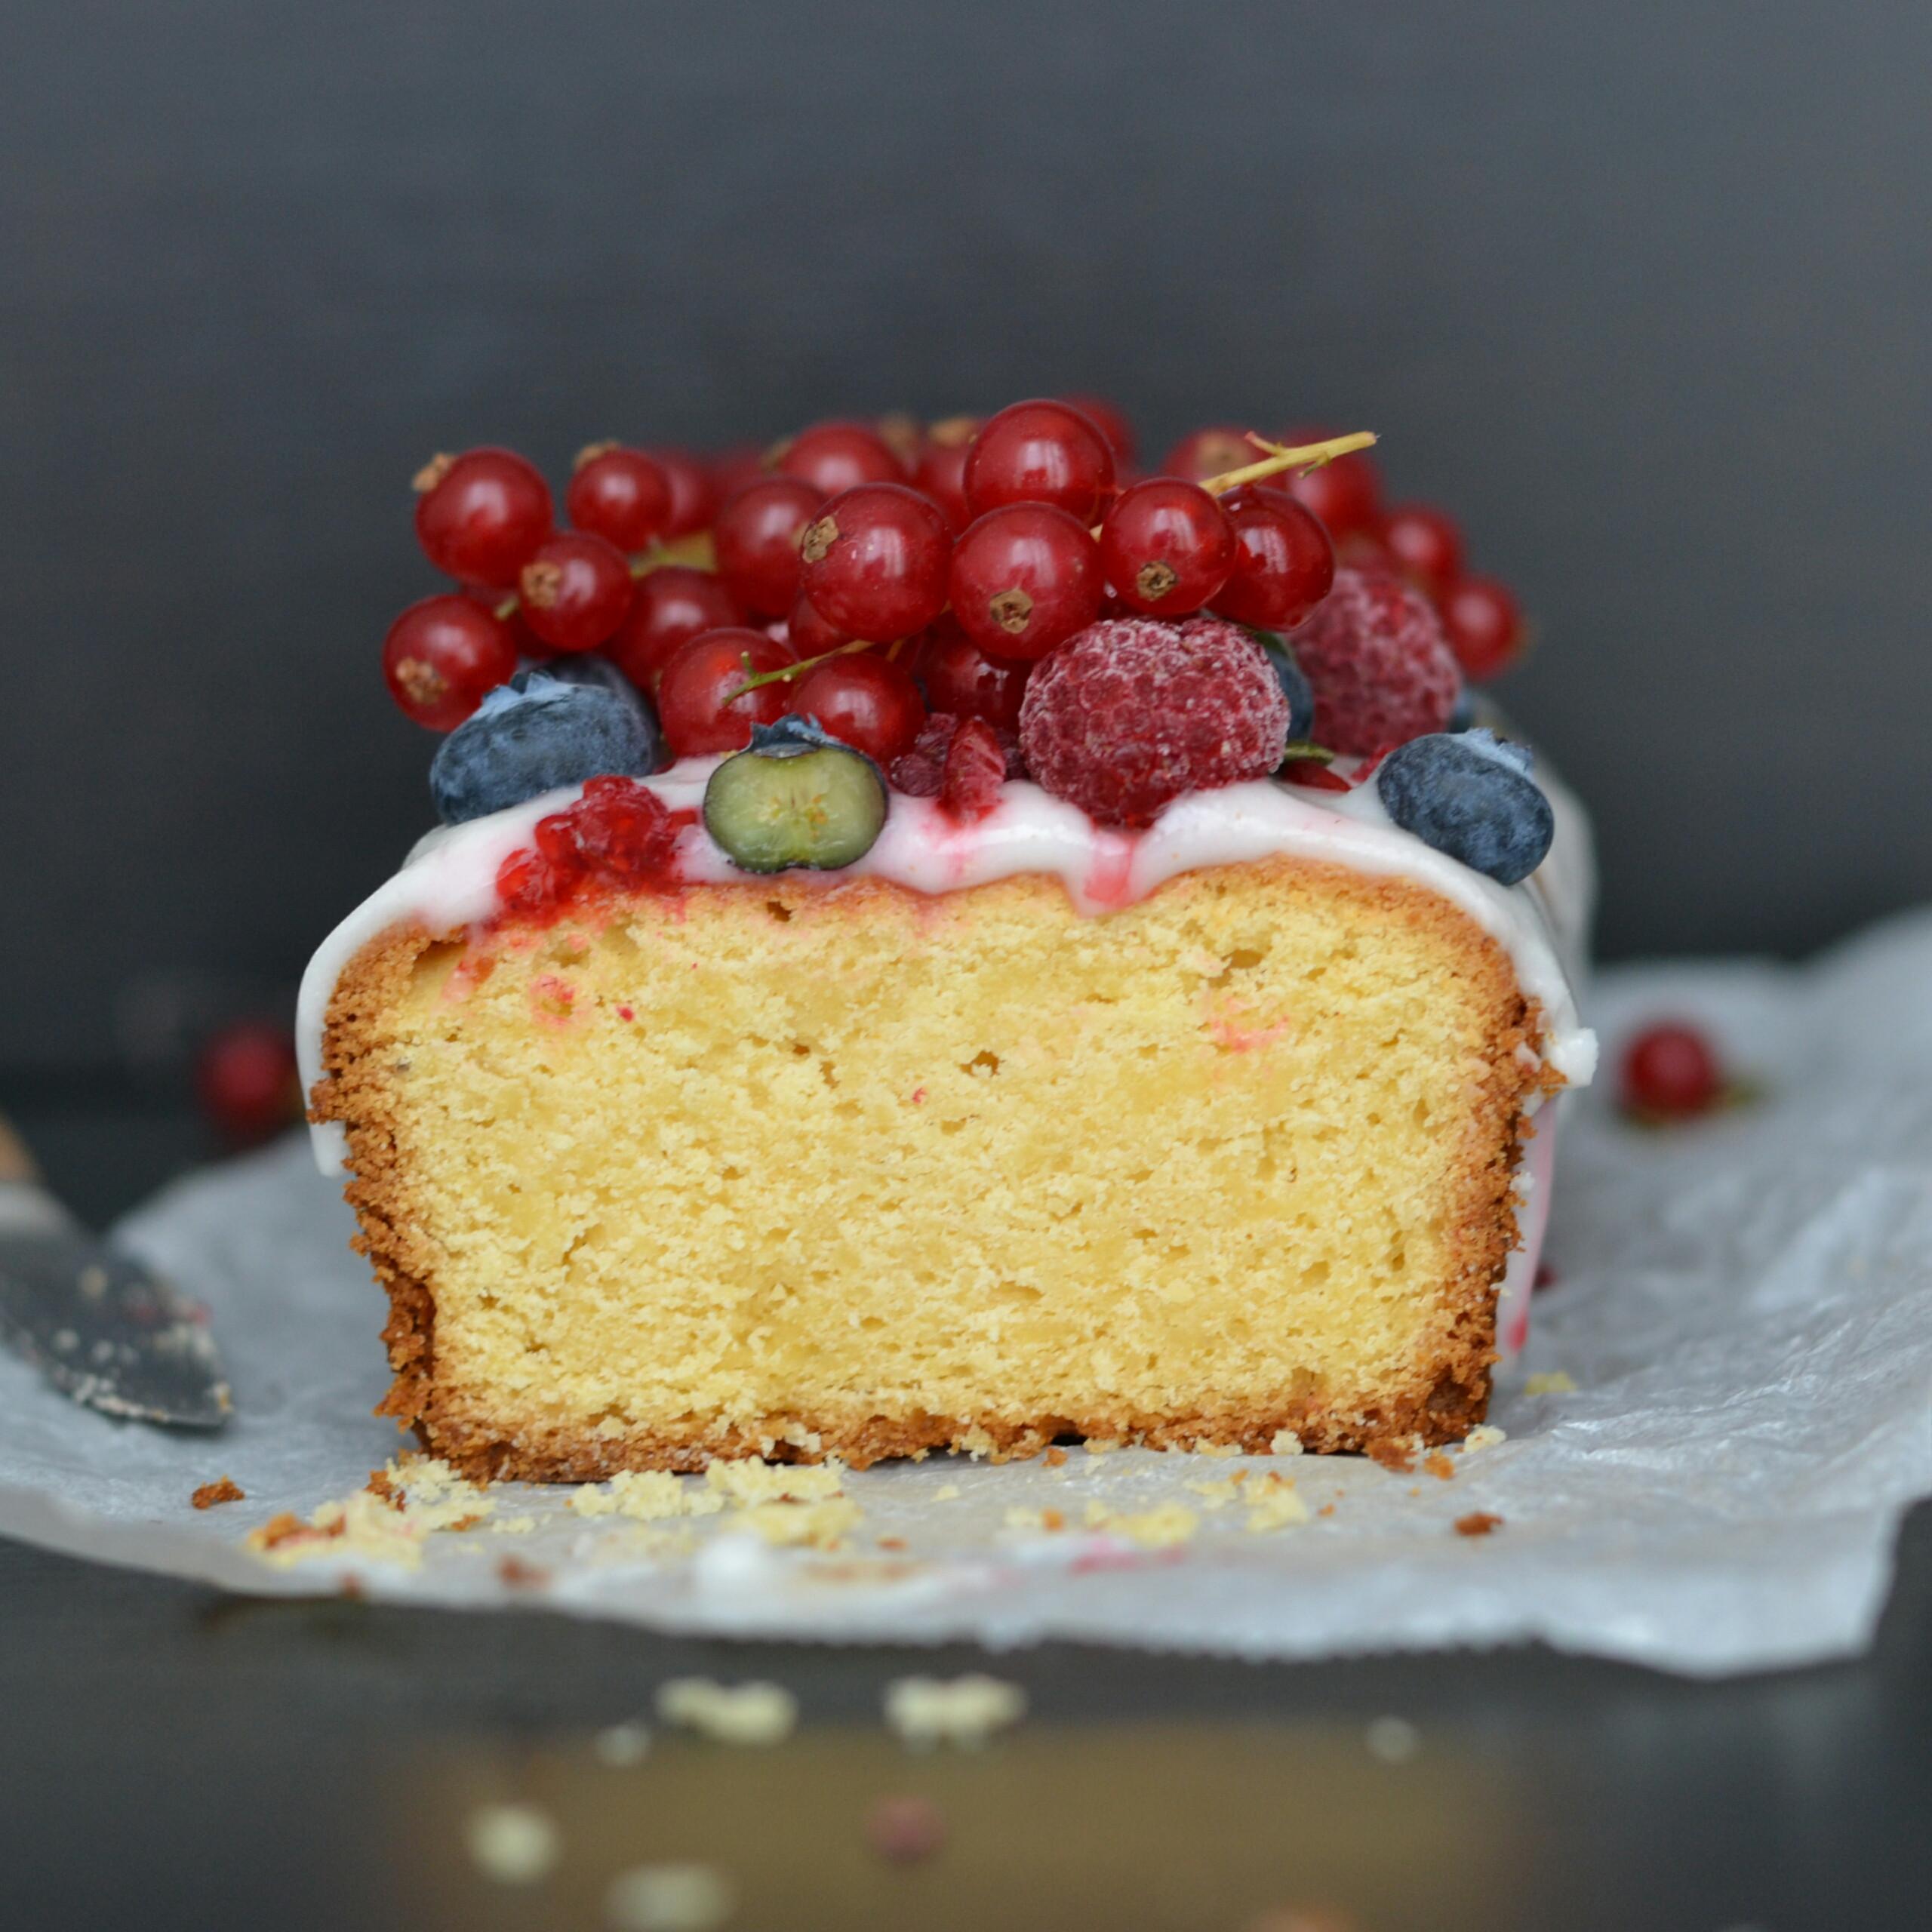 Gluten Free Vegan Recipes  Gluten free vegan cake Anne Travel Foo